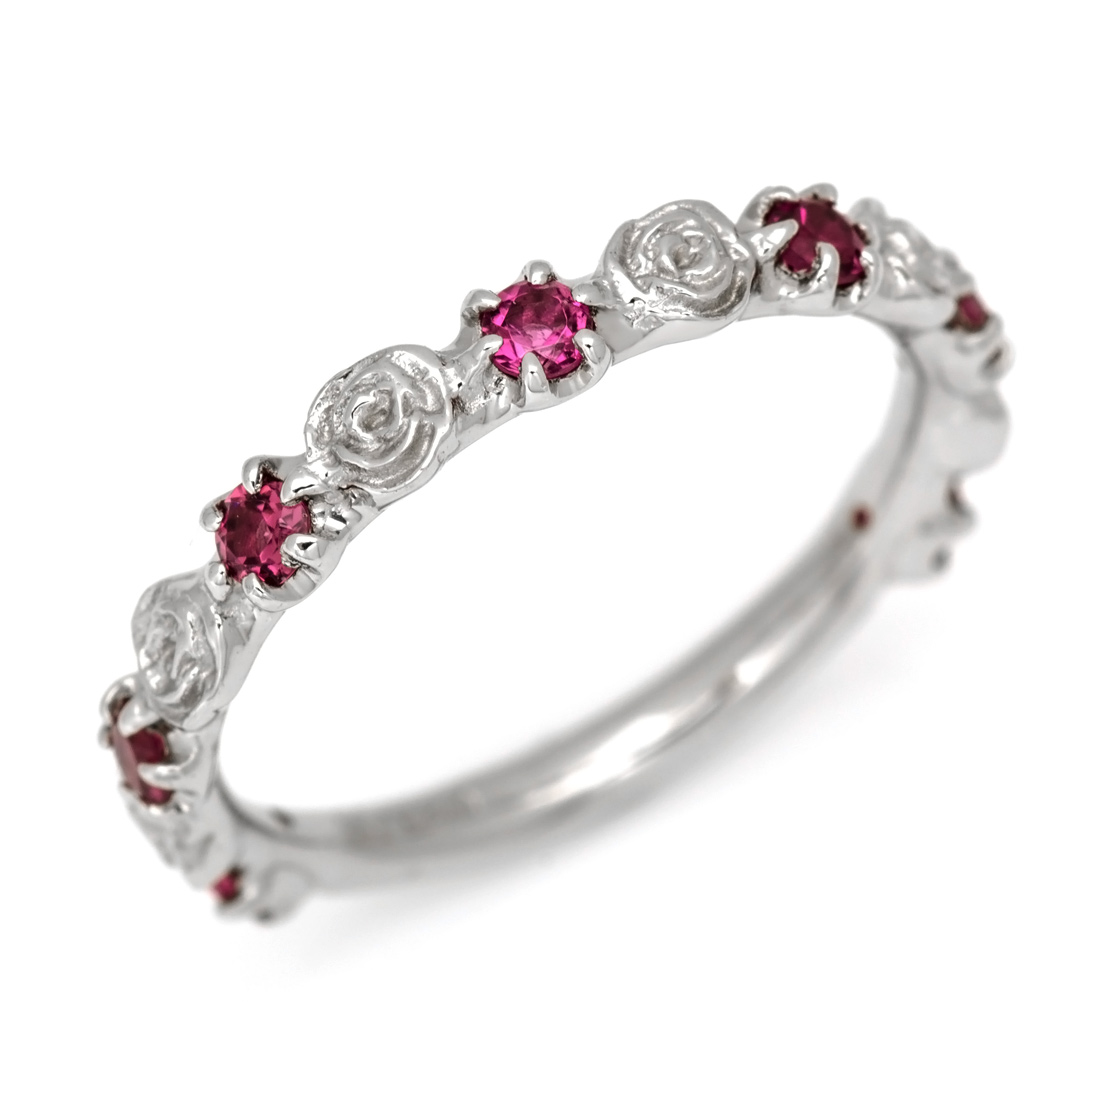 K18 ルベライト バラモチーフ リング 「rosa」 18K 18金 ゴールド ピンクトルマリン 誕生日 10月誕生石 薔薇 ローズ 重ね着け 結婚記念日 結婚式 誕生日 刻印 文字入れ ギフト ピンキーリング対応可能